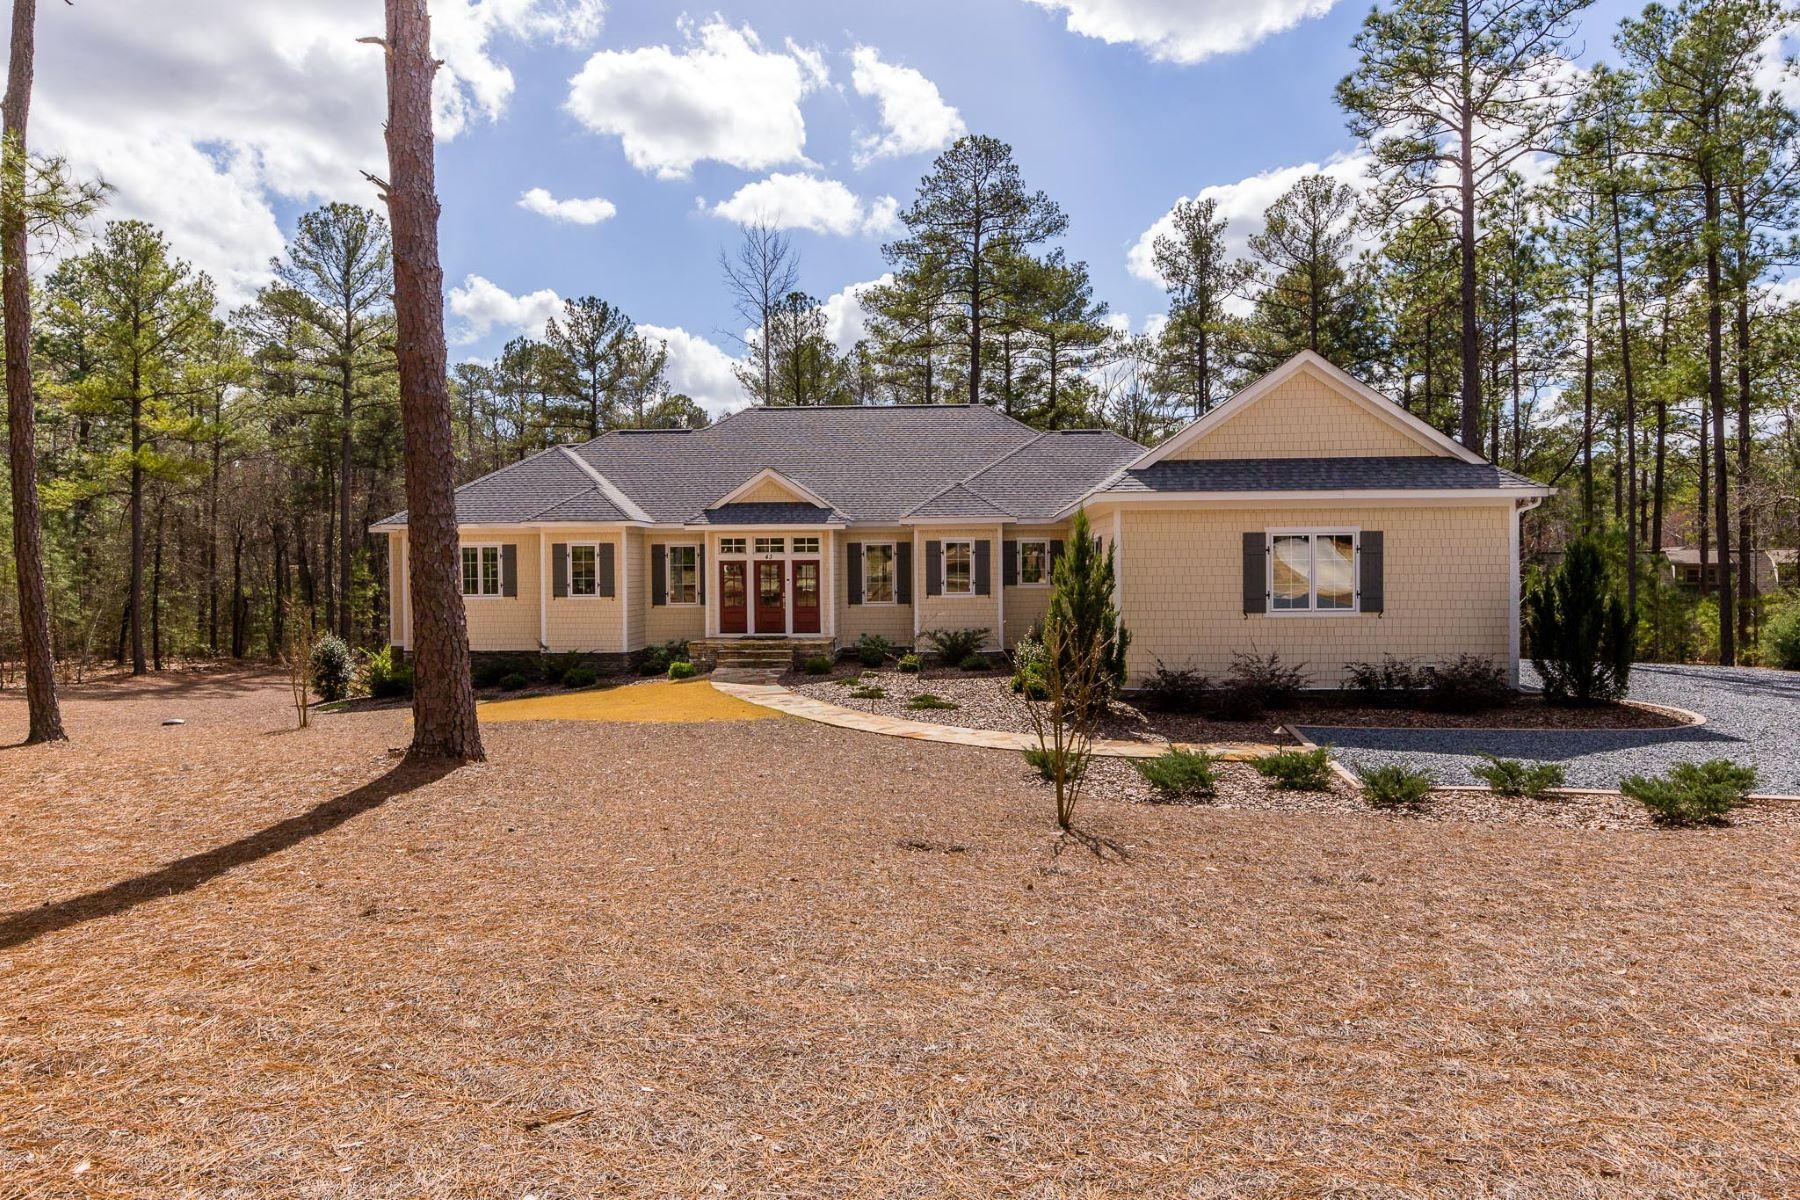 Single Family Home for Active at Captivating Custom Home in Forest Creek 43 Ridgeland Street Pinehurst, North Carolina 28374 United States